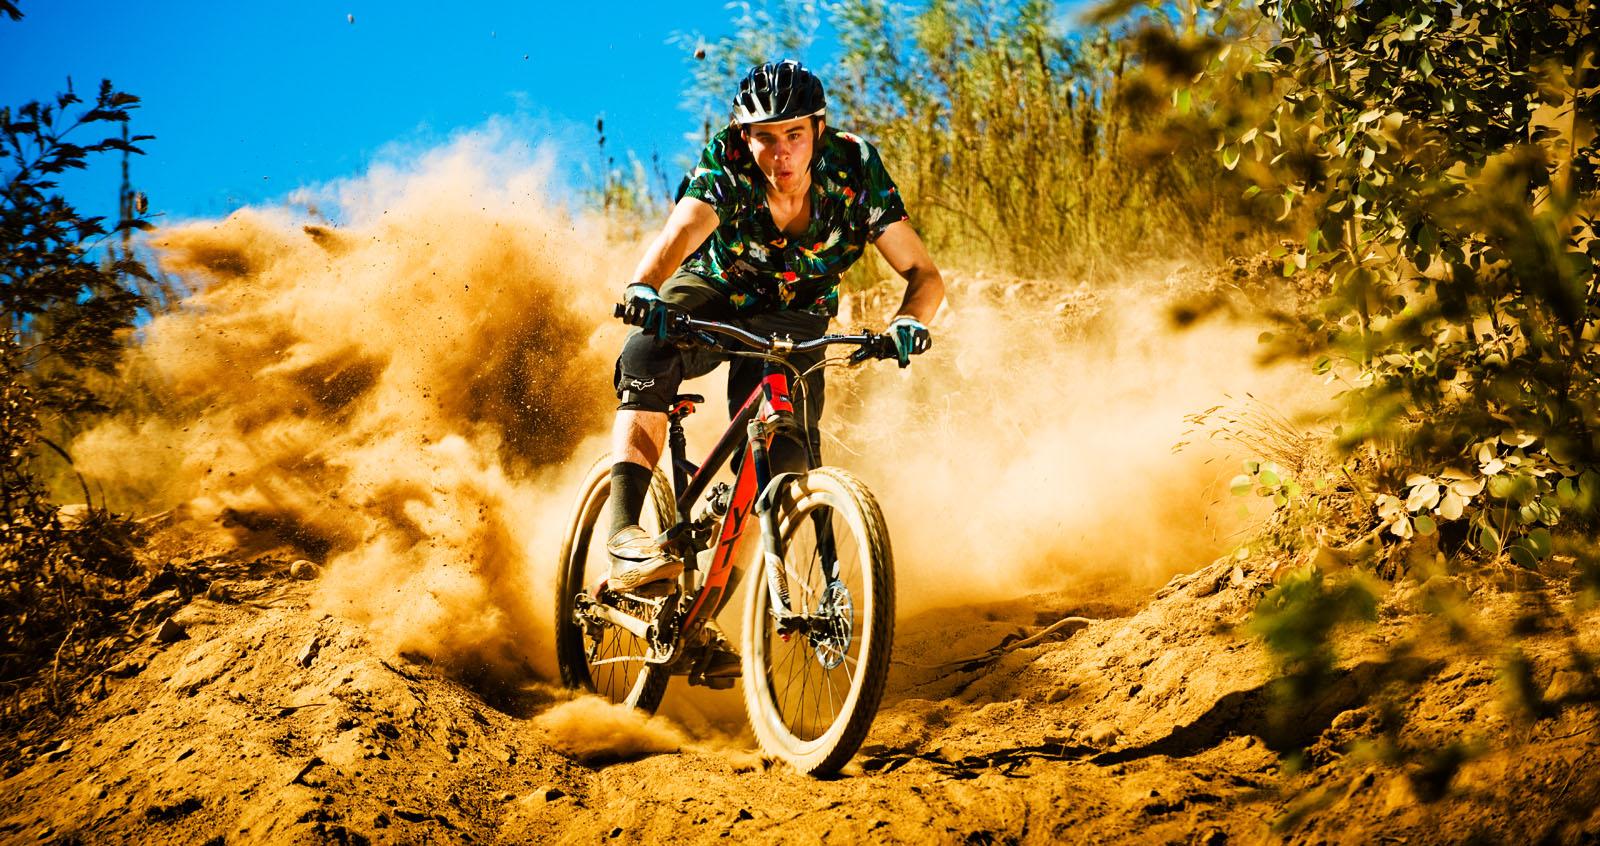 Theo Erlangsen smashing the dusty berm on his YT Capra